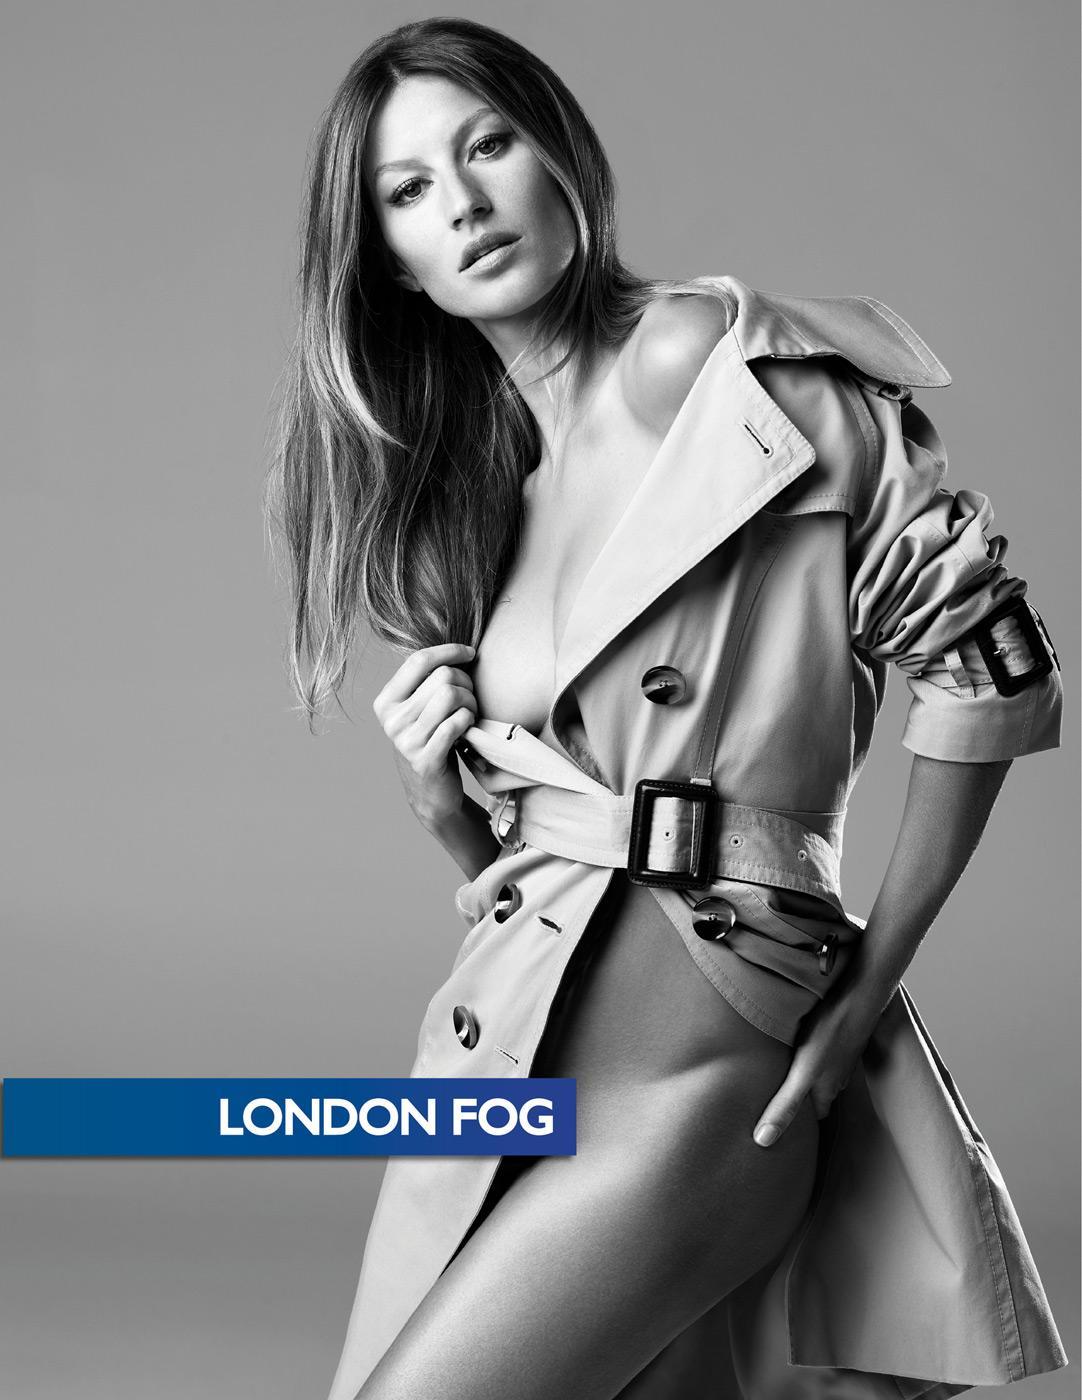 London Fog Print Ad -  Gisele Bündchen, 2